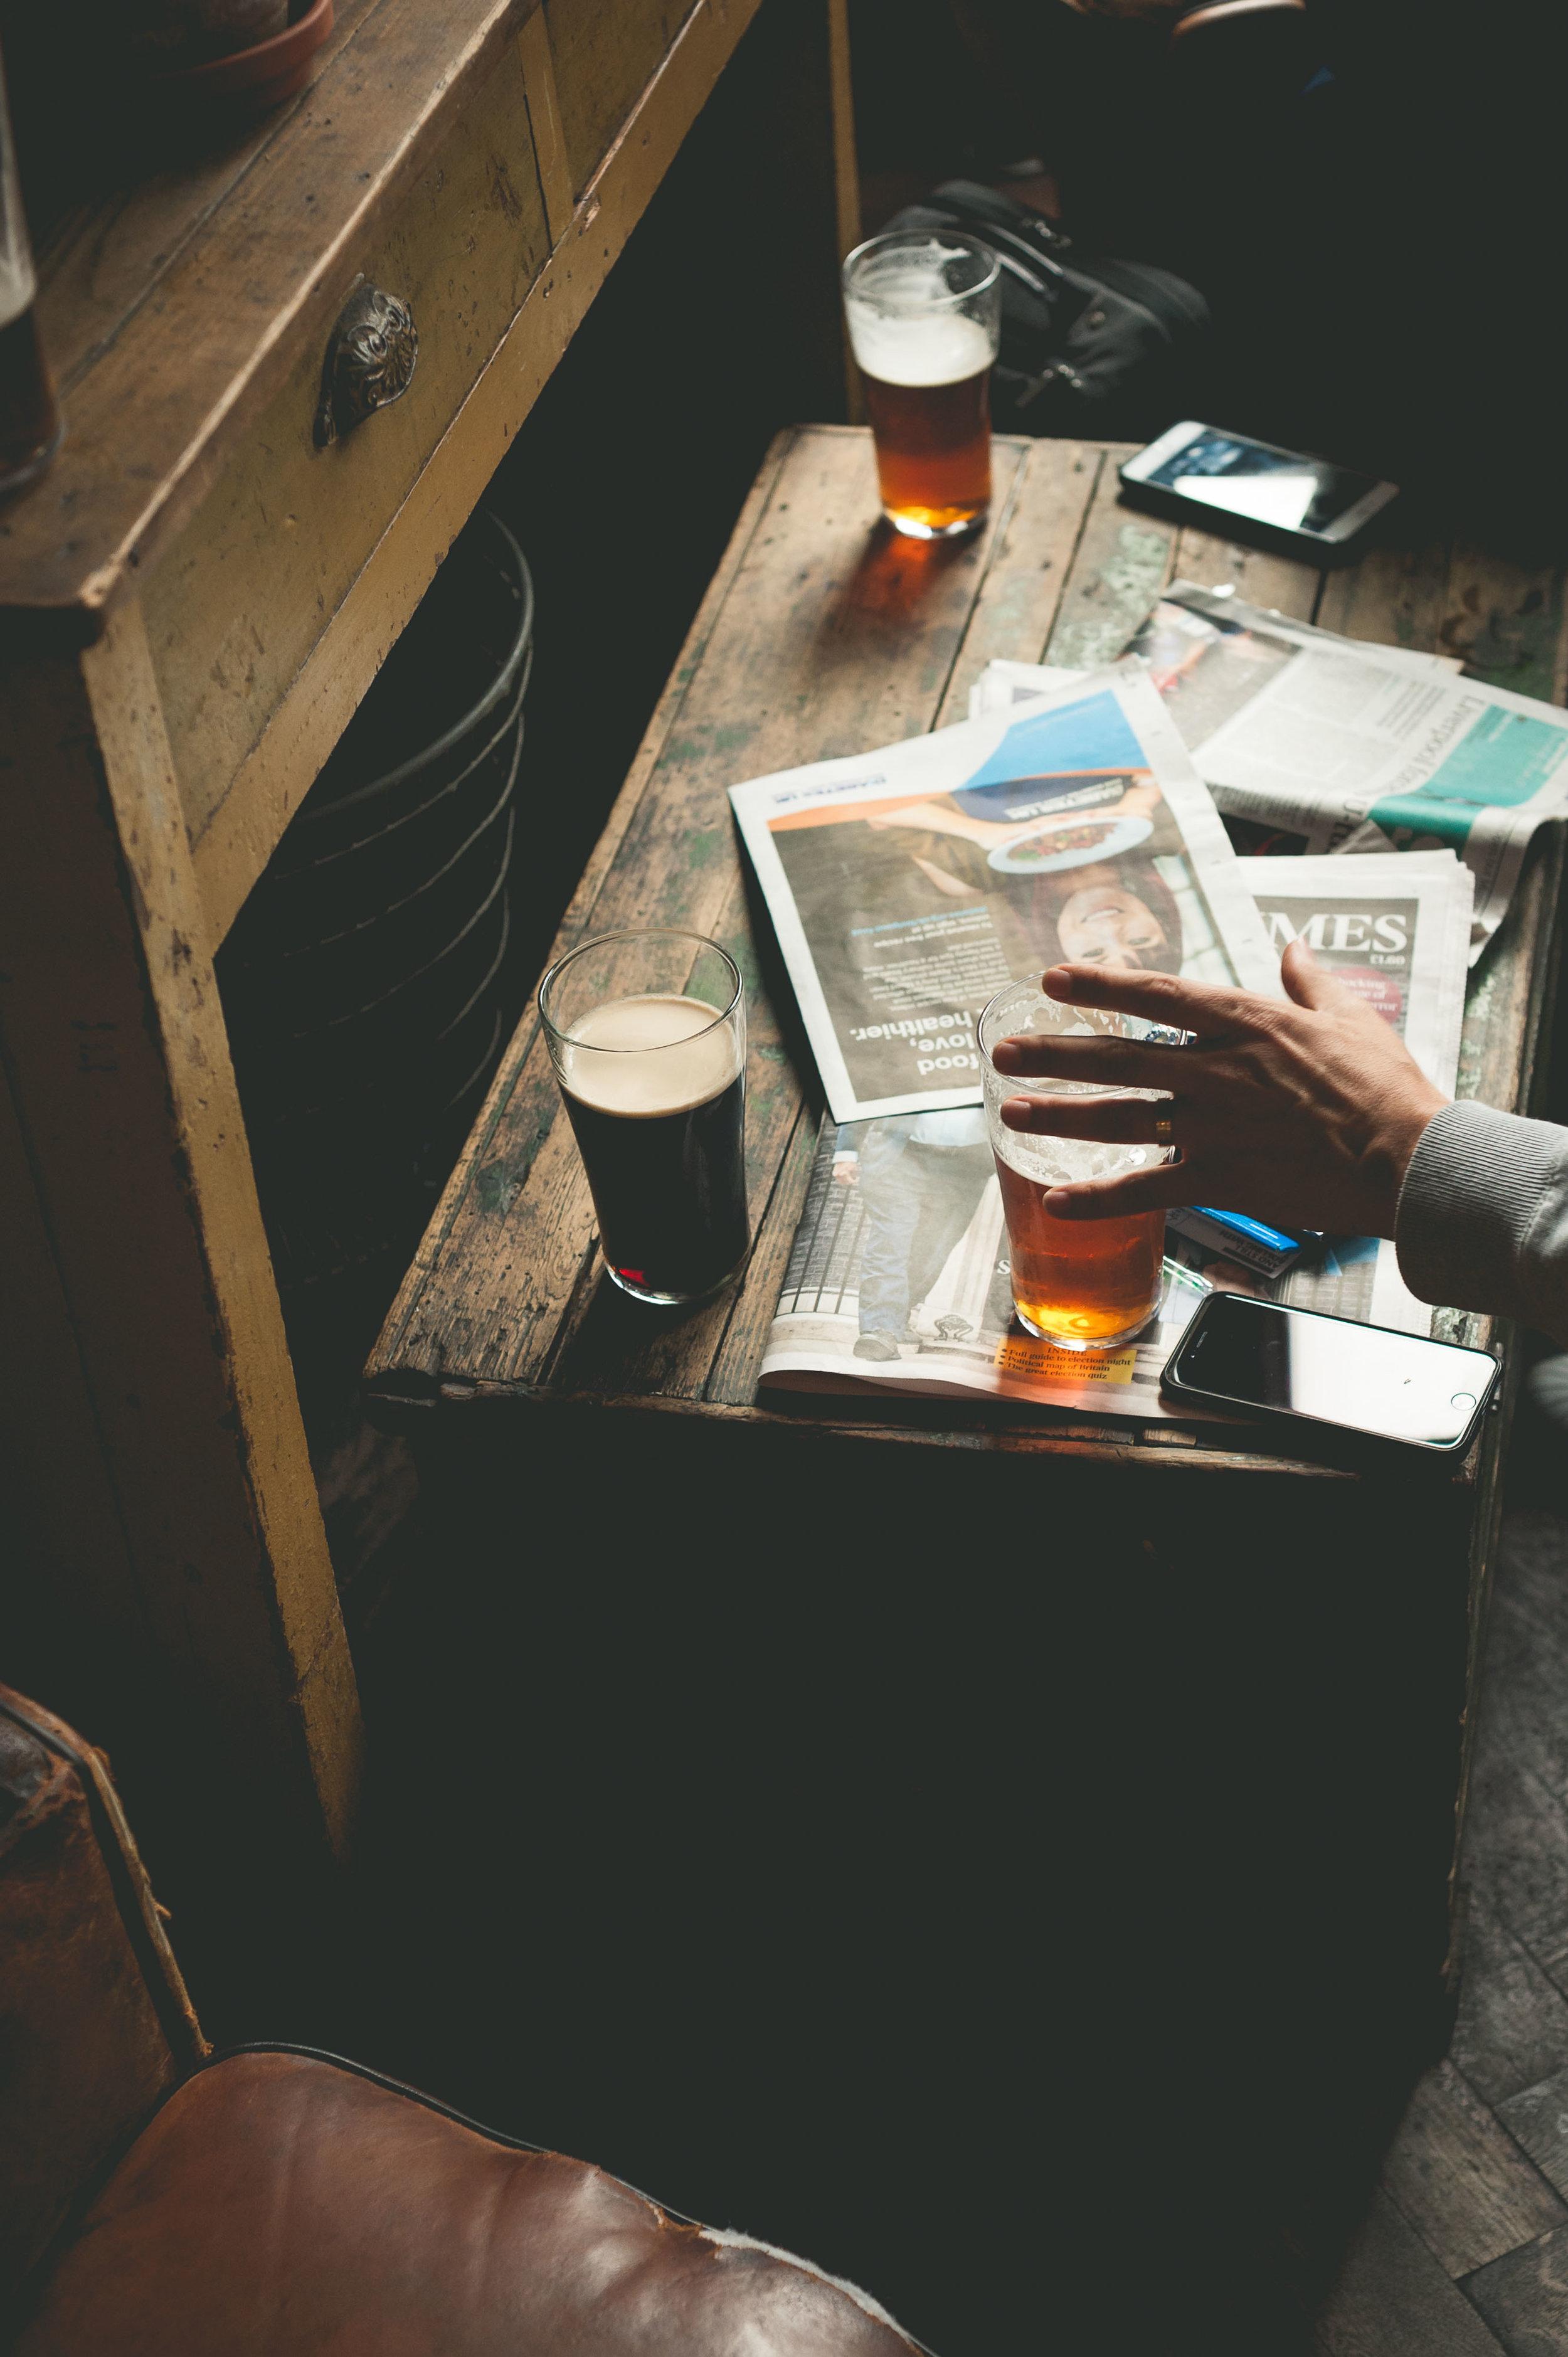 culpepper-beer-bar-restaurant-london.jpg